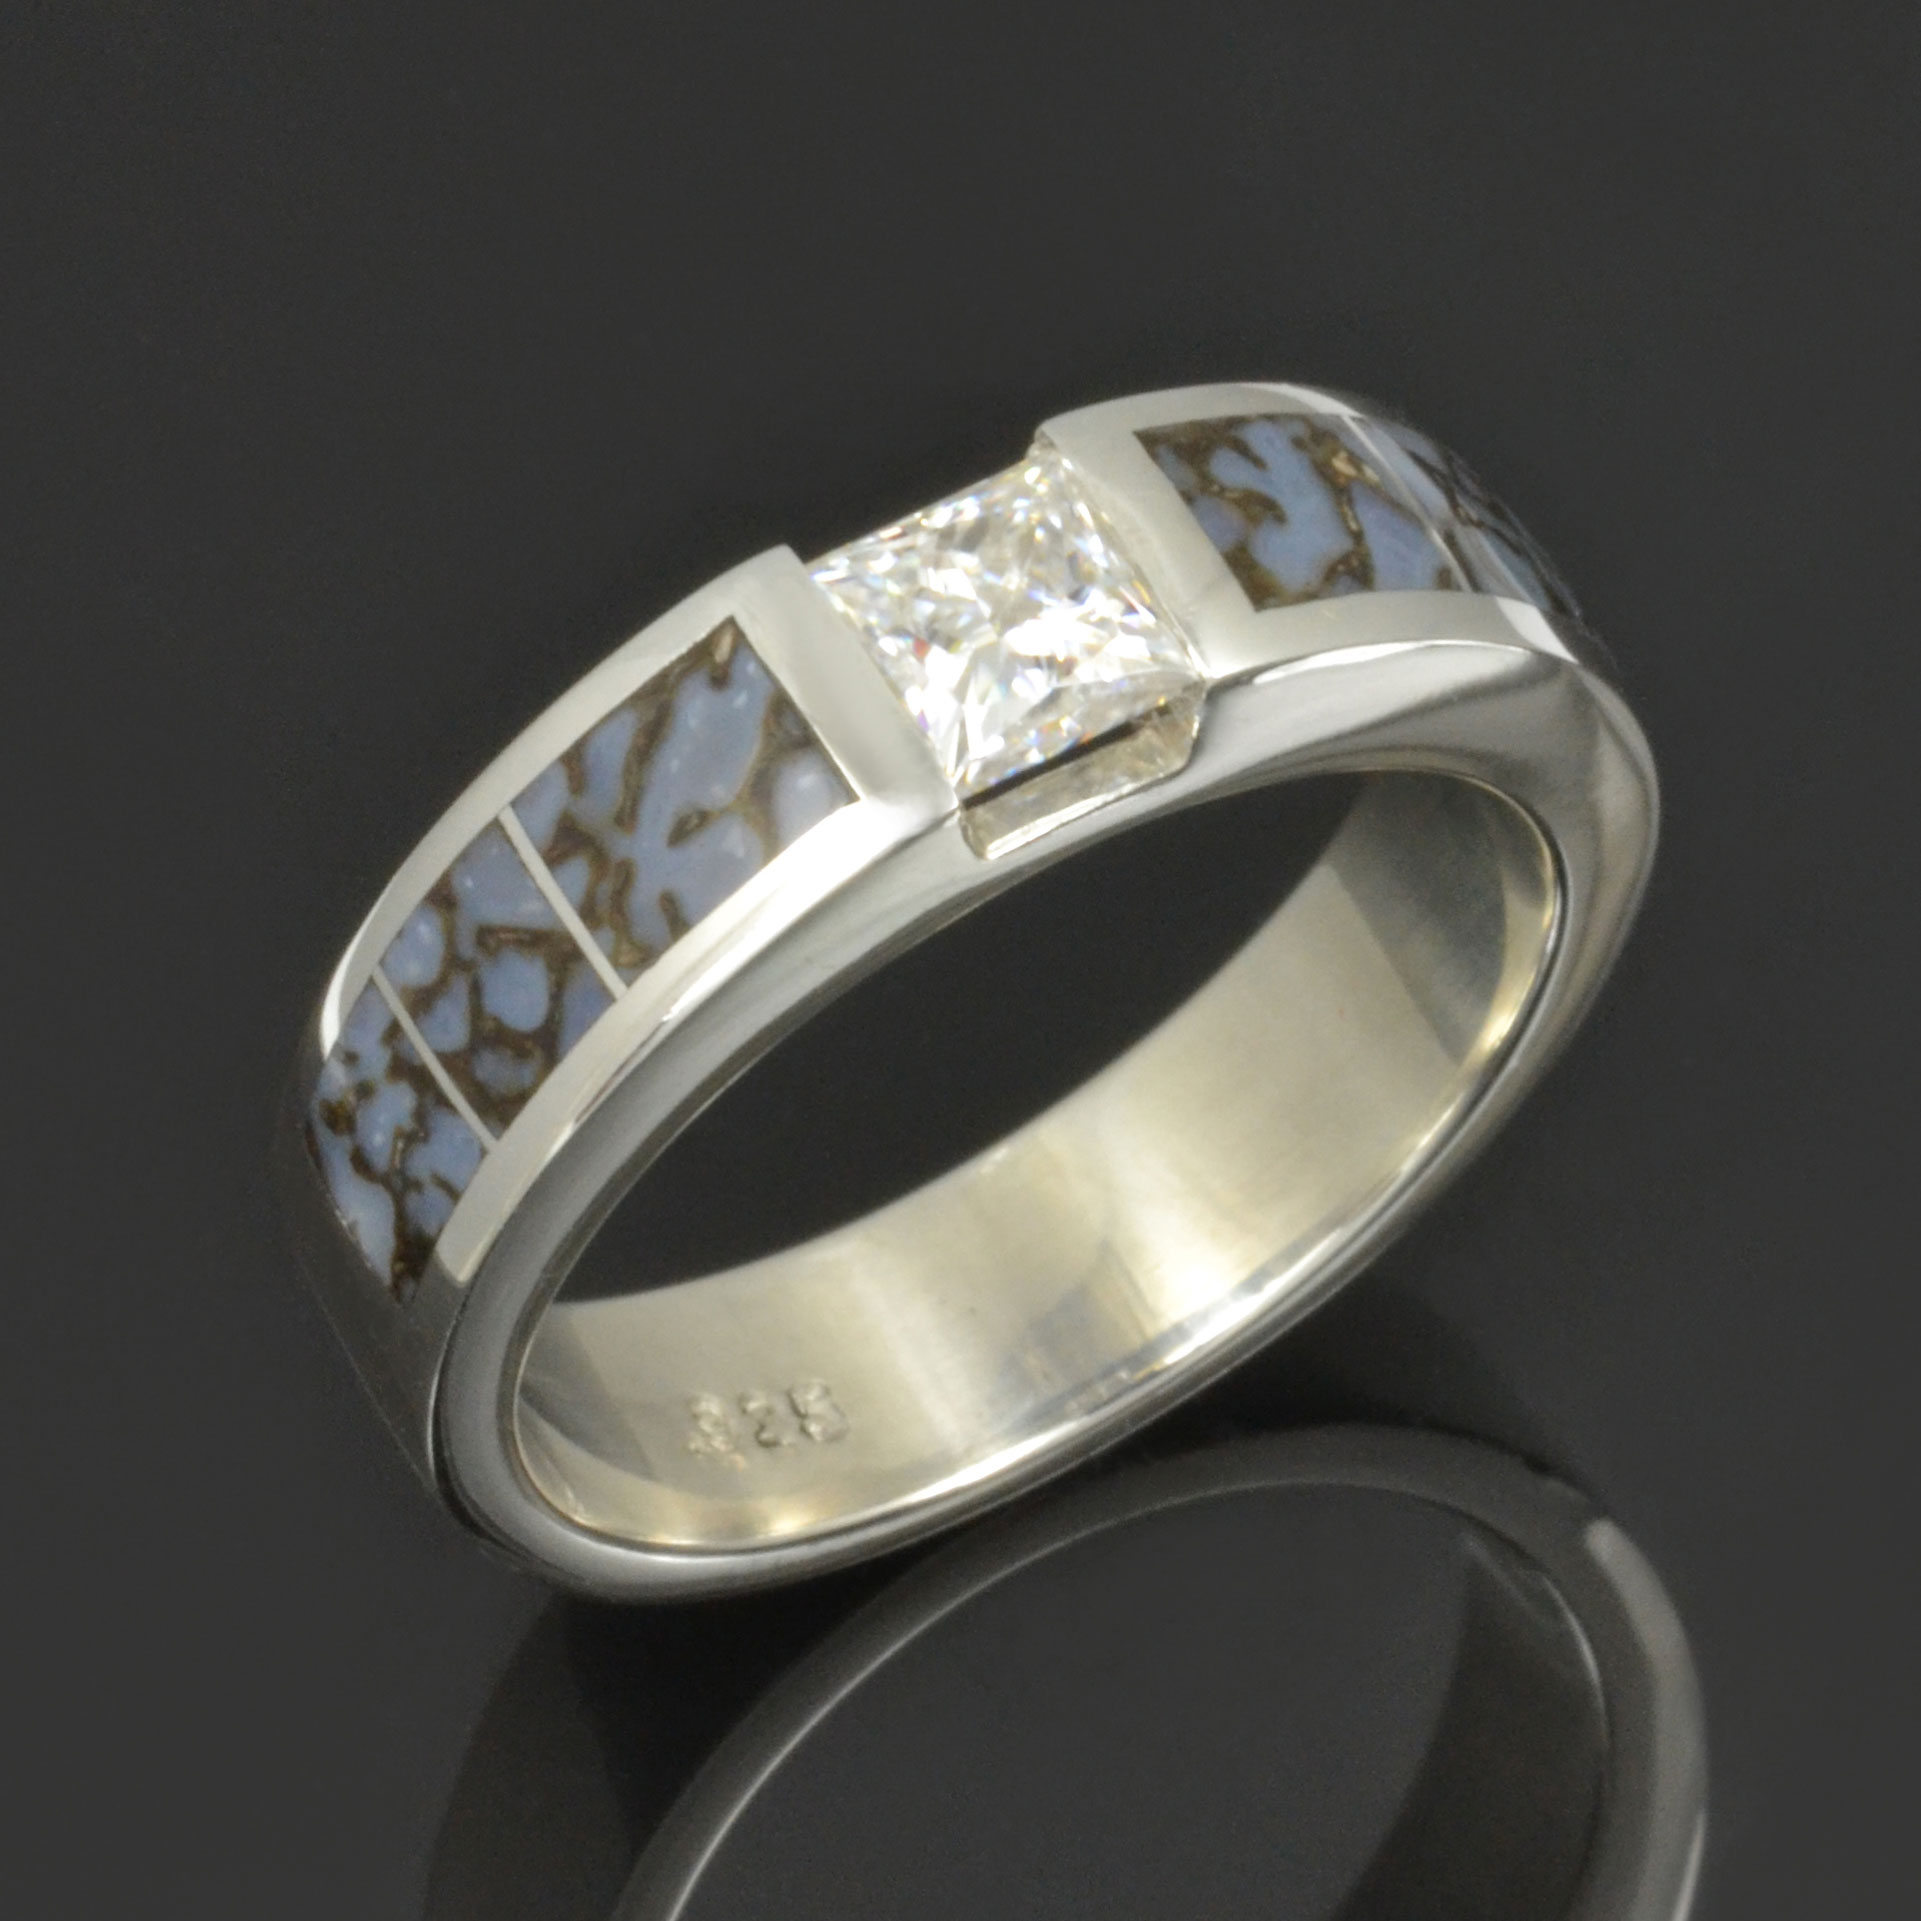 Blue dinosaur bone ring with moissanite set in sterling silver